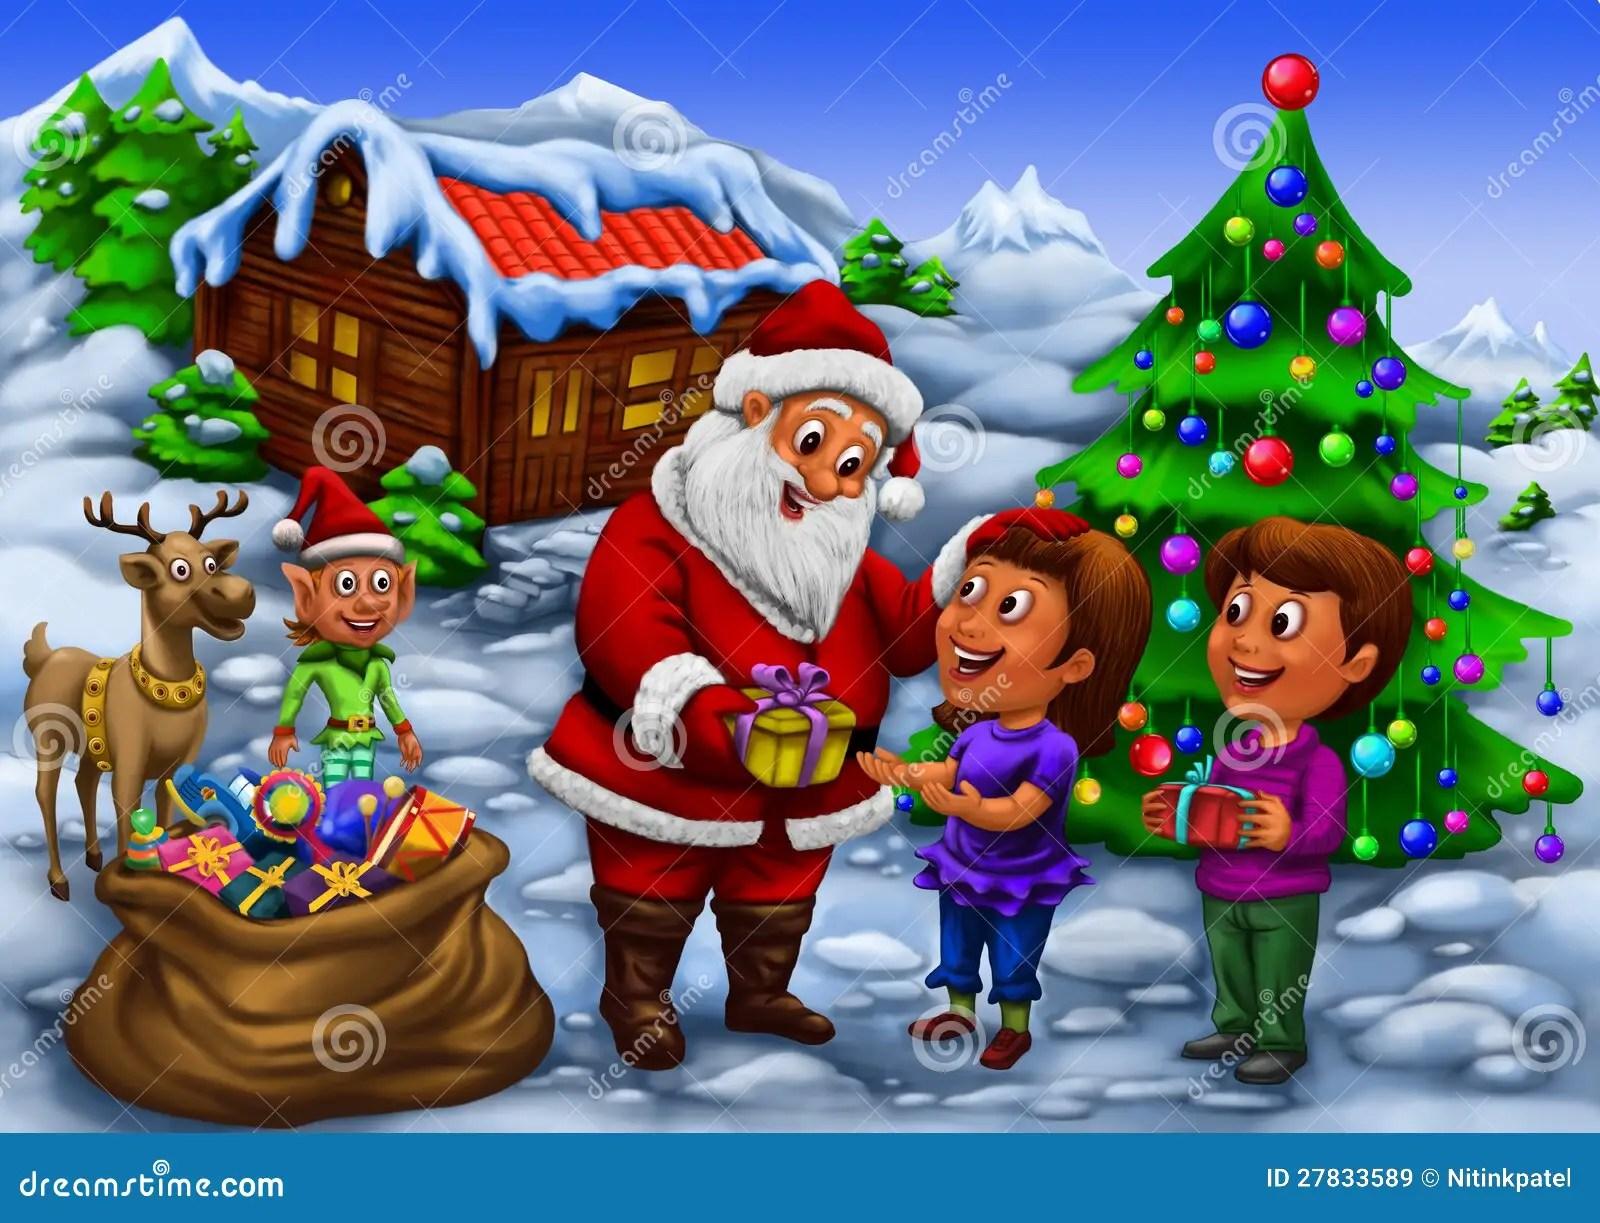 Santa Claus And His Reindeer